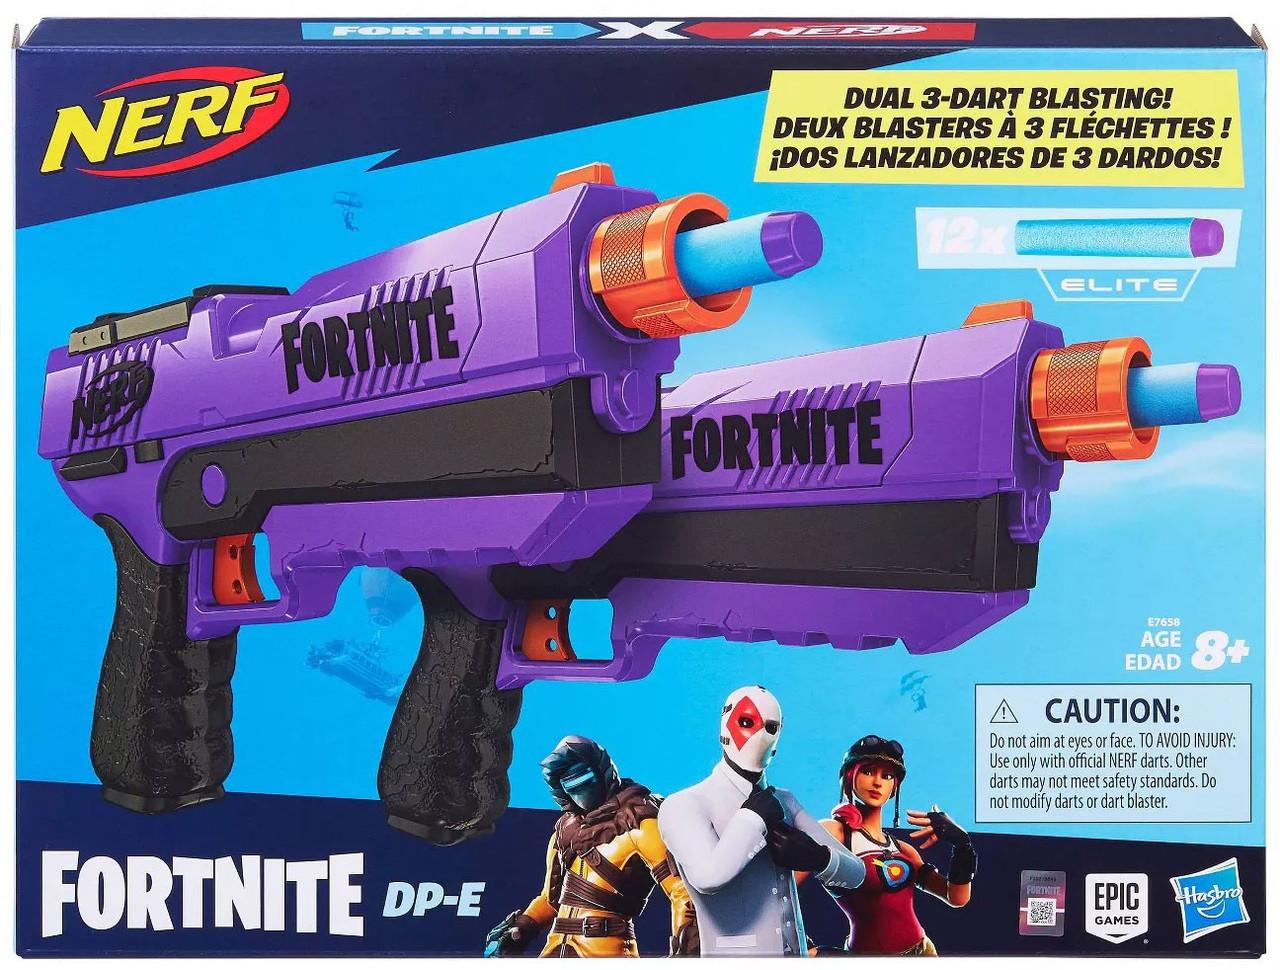 Fortnite Degrade Weapon Nerf Fortnite Dp E Exclusive Dart Blaster Toy Dual 3 Dart Blasting Hasbro Toys Toywiz